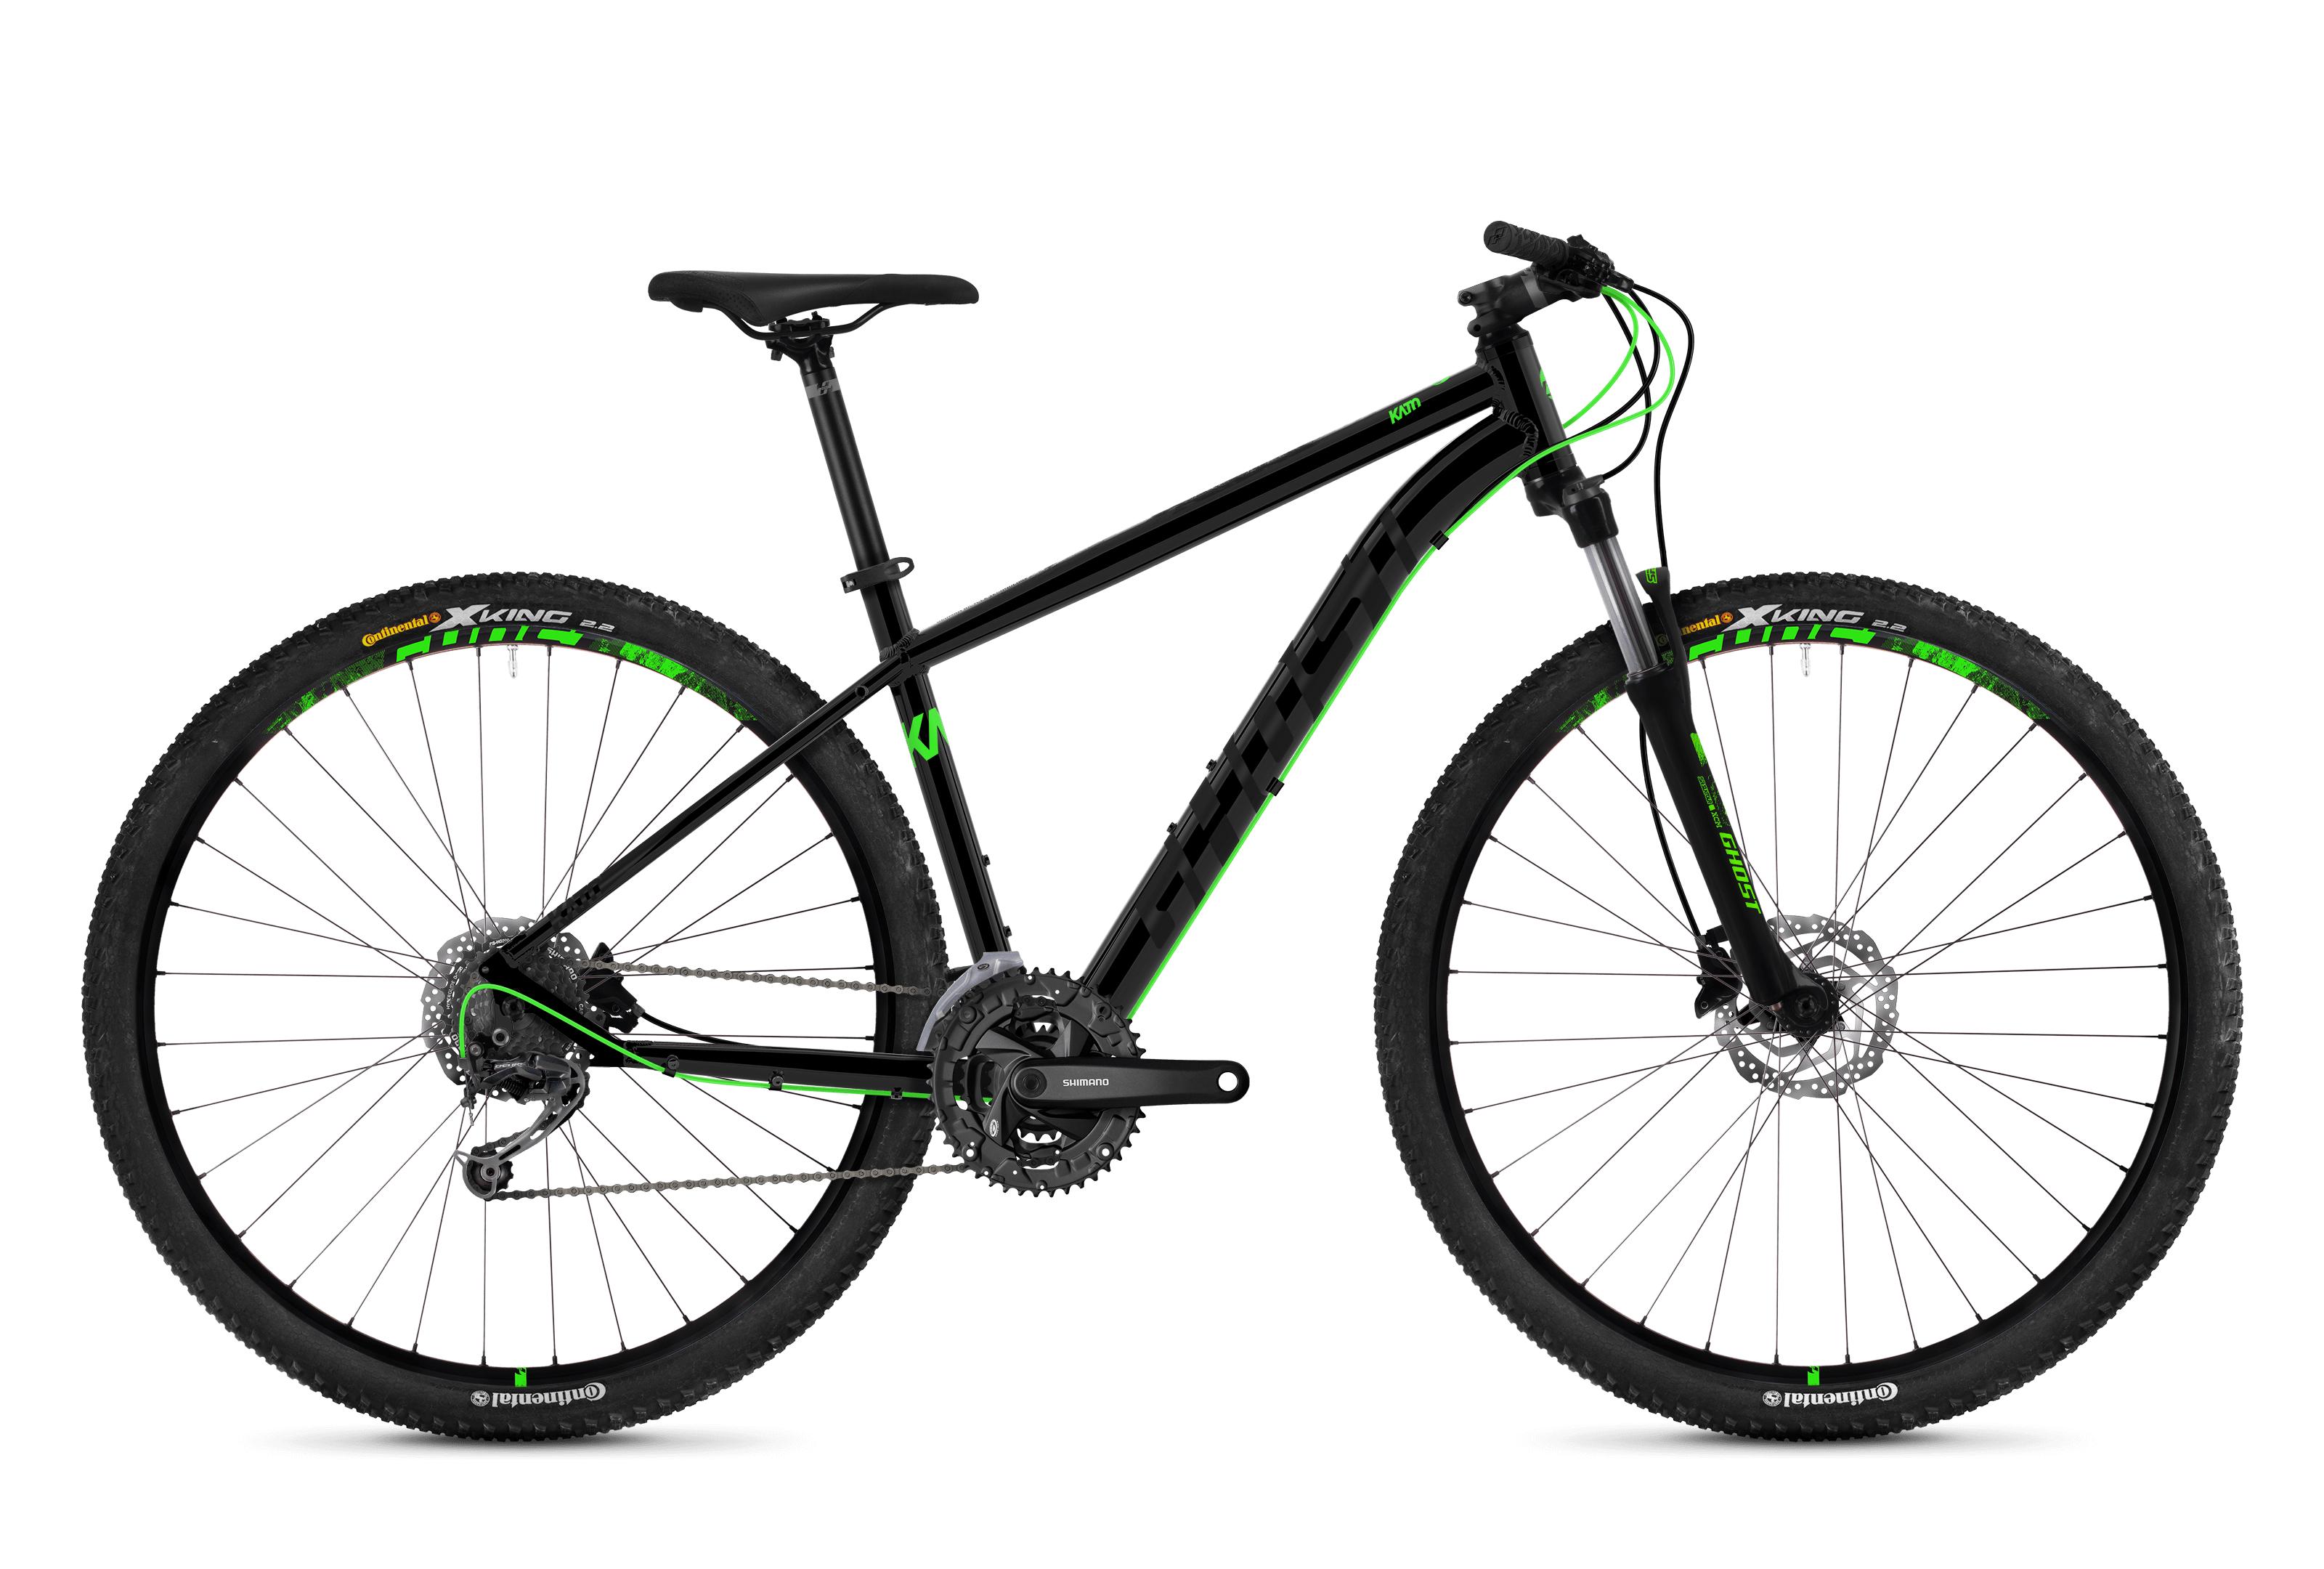 Horské kolo GHOST Kato 4.9 black / green XL 2018